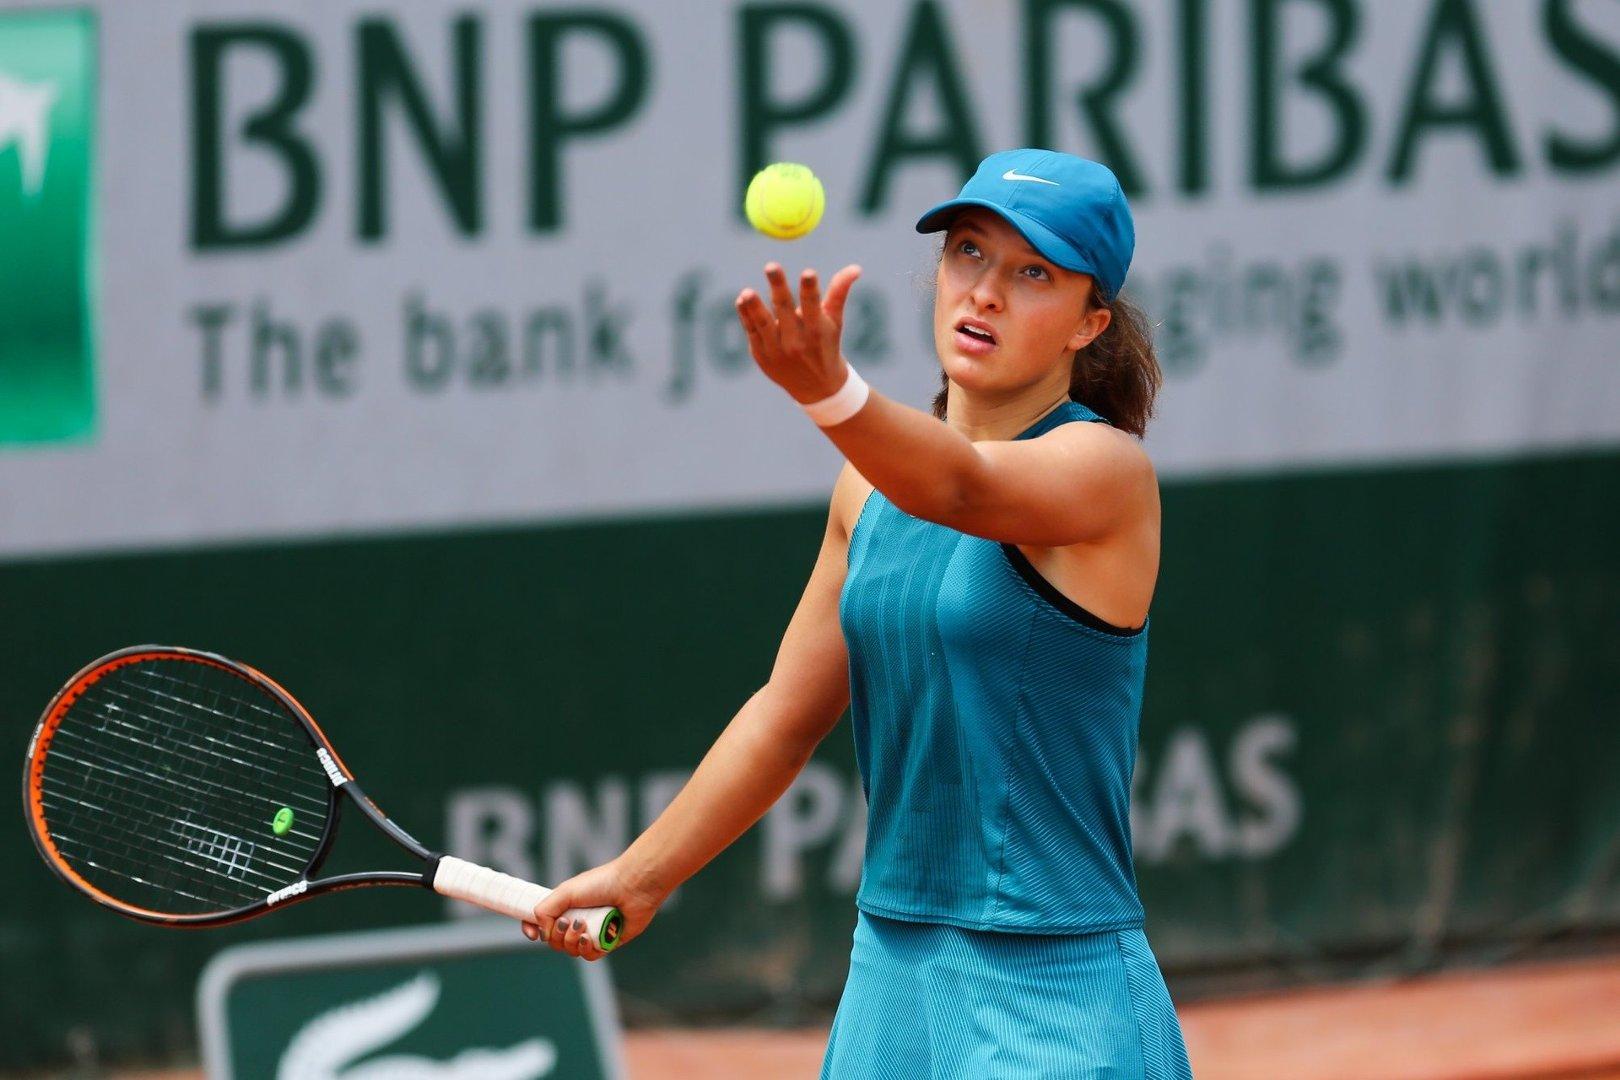 Tenis: Iga Świątek mistrzynią Wimbledonu juniorek. Polka ...